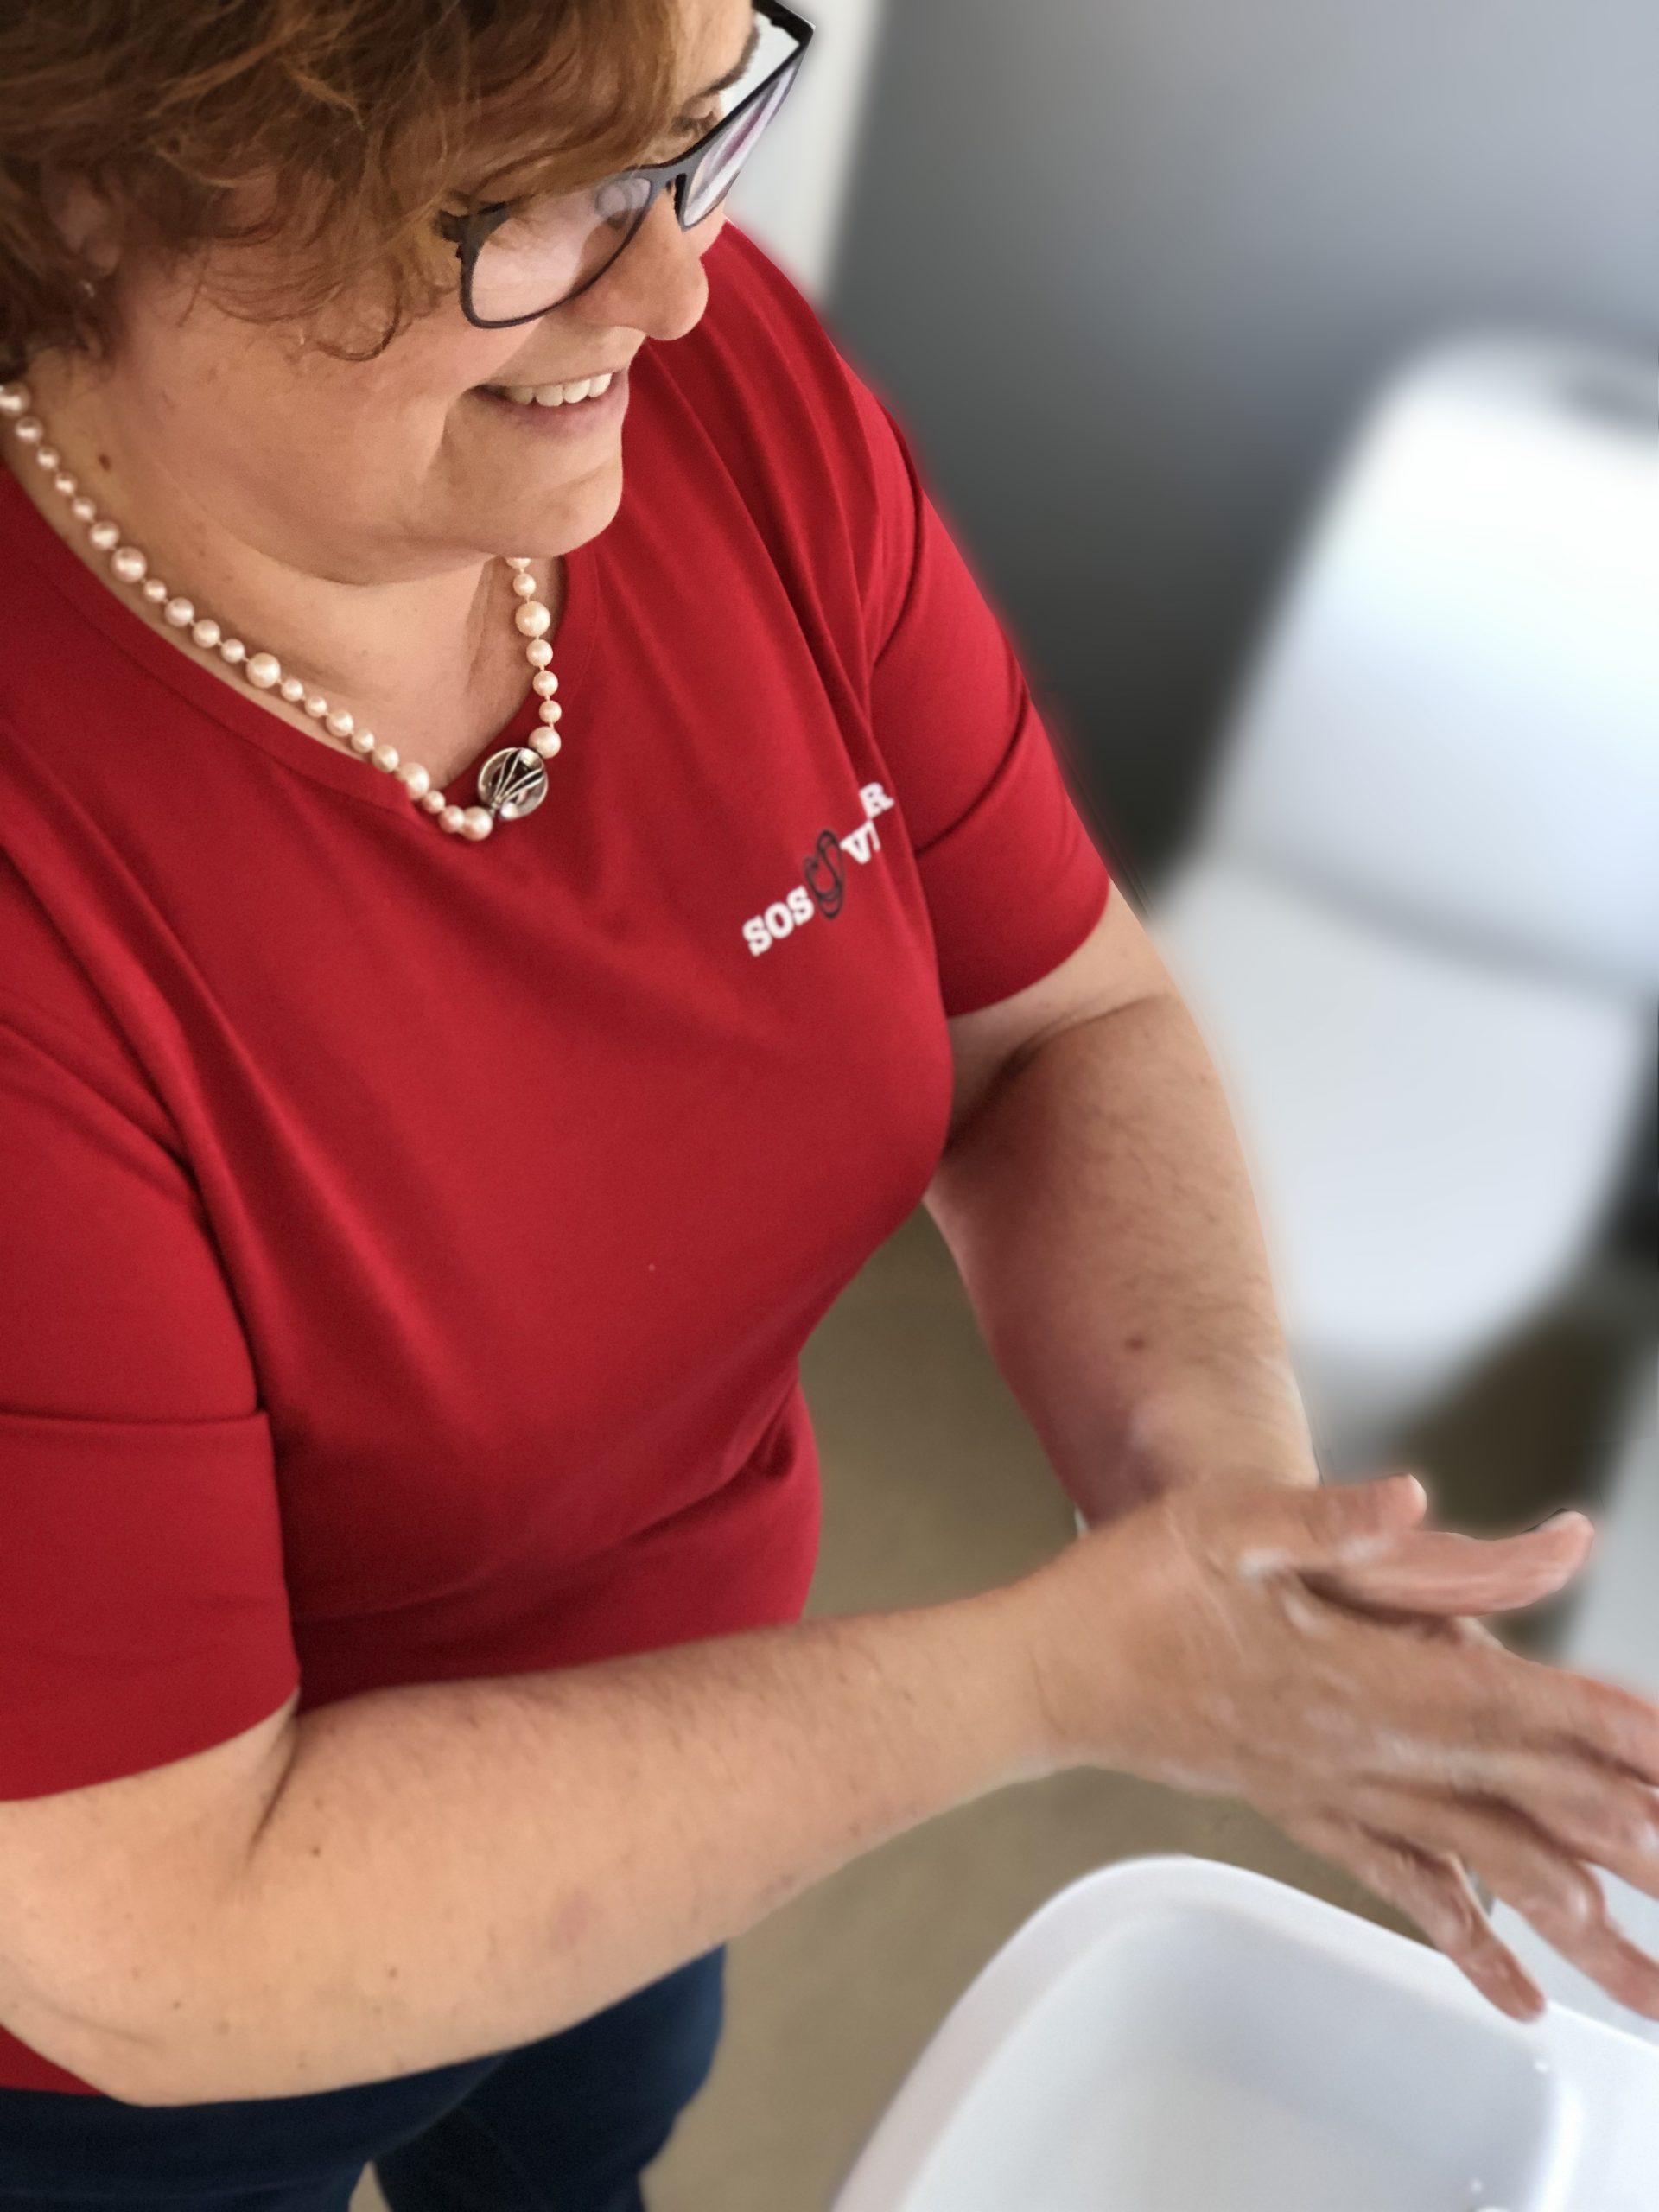 sos-vikar-haand-vask-hygiejne-retningslinjer